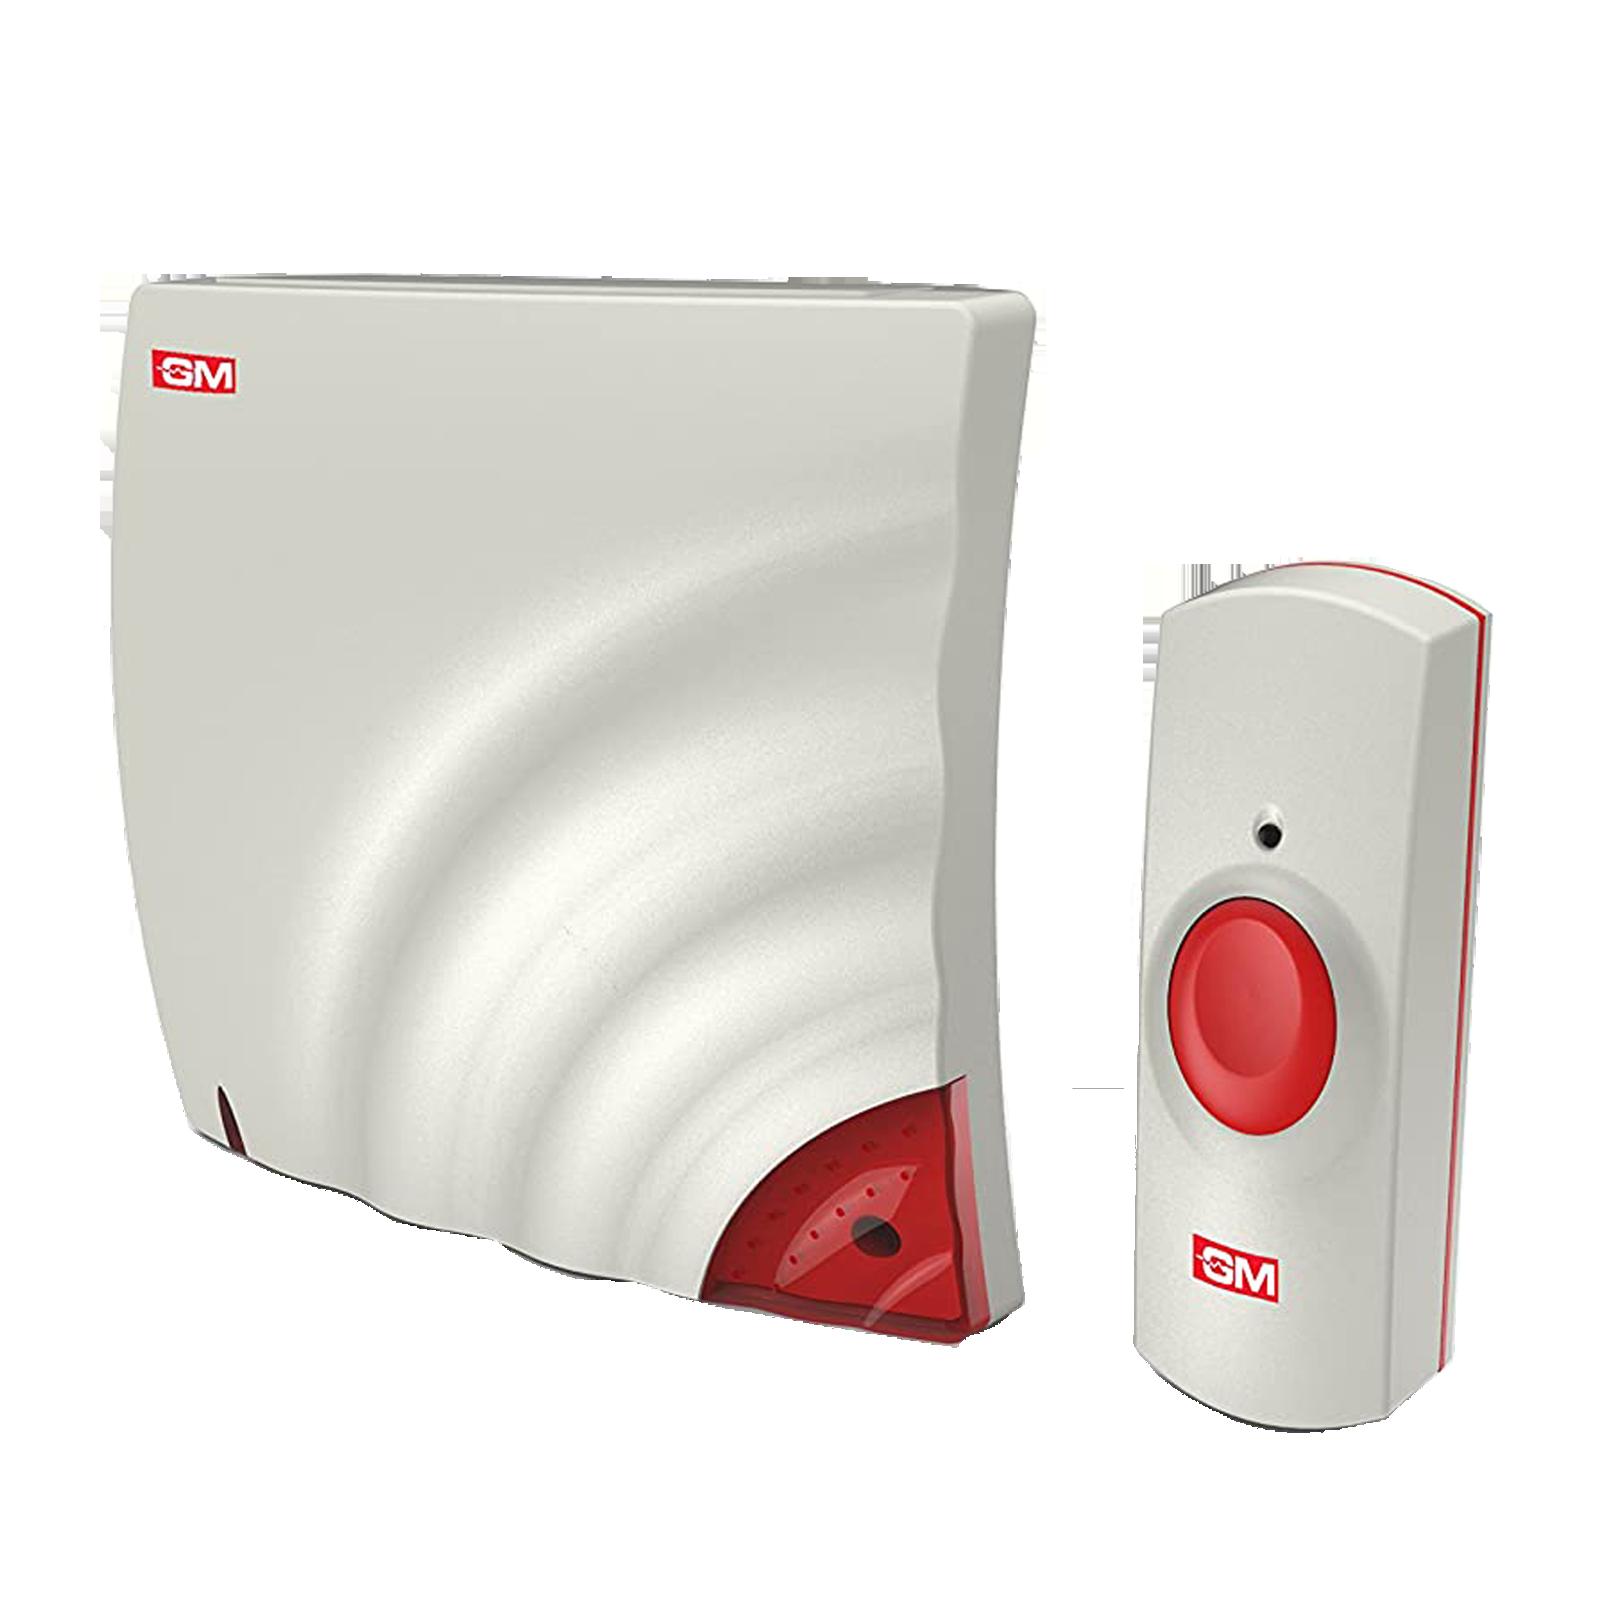 GM Wave Door Bell (Wireless, 4061, White/Red)_1